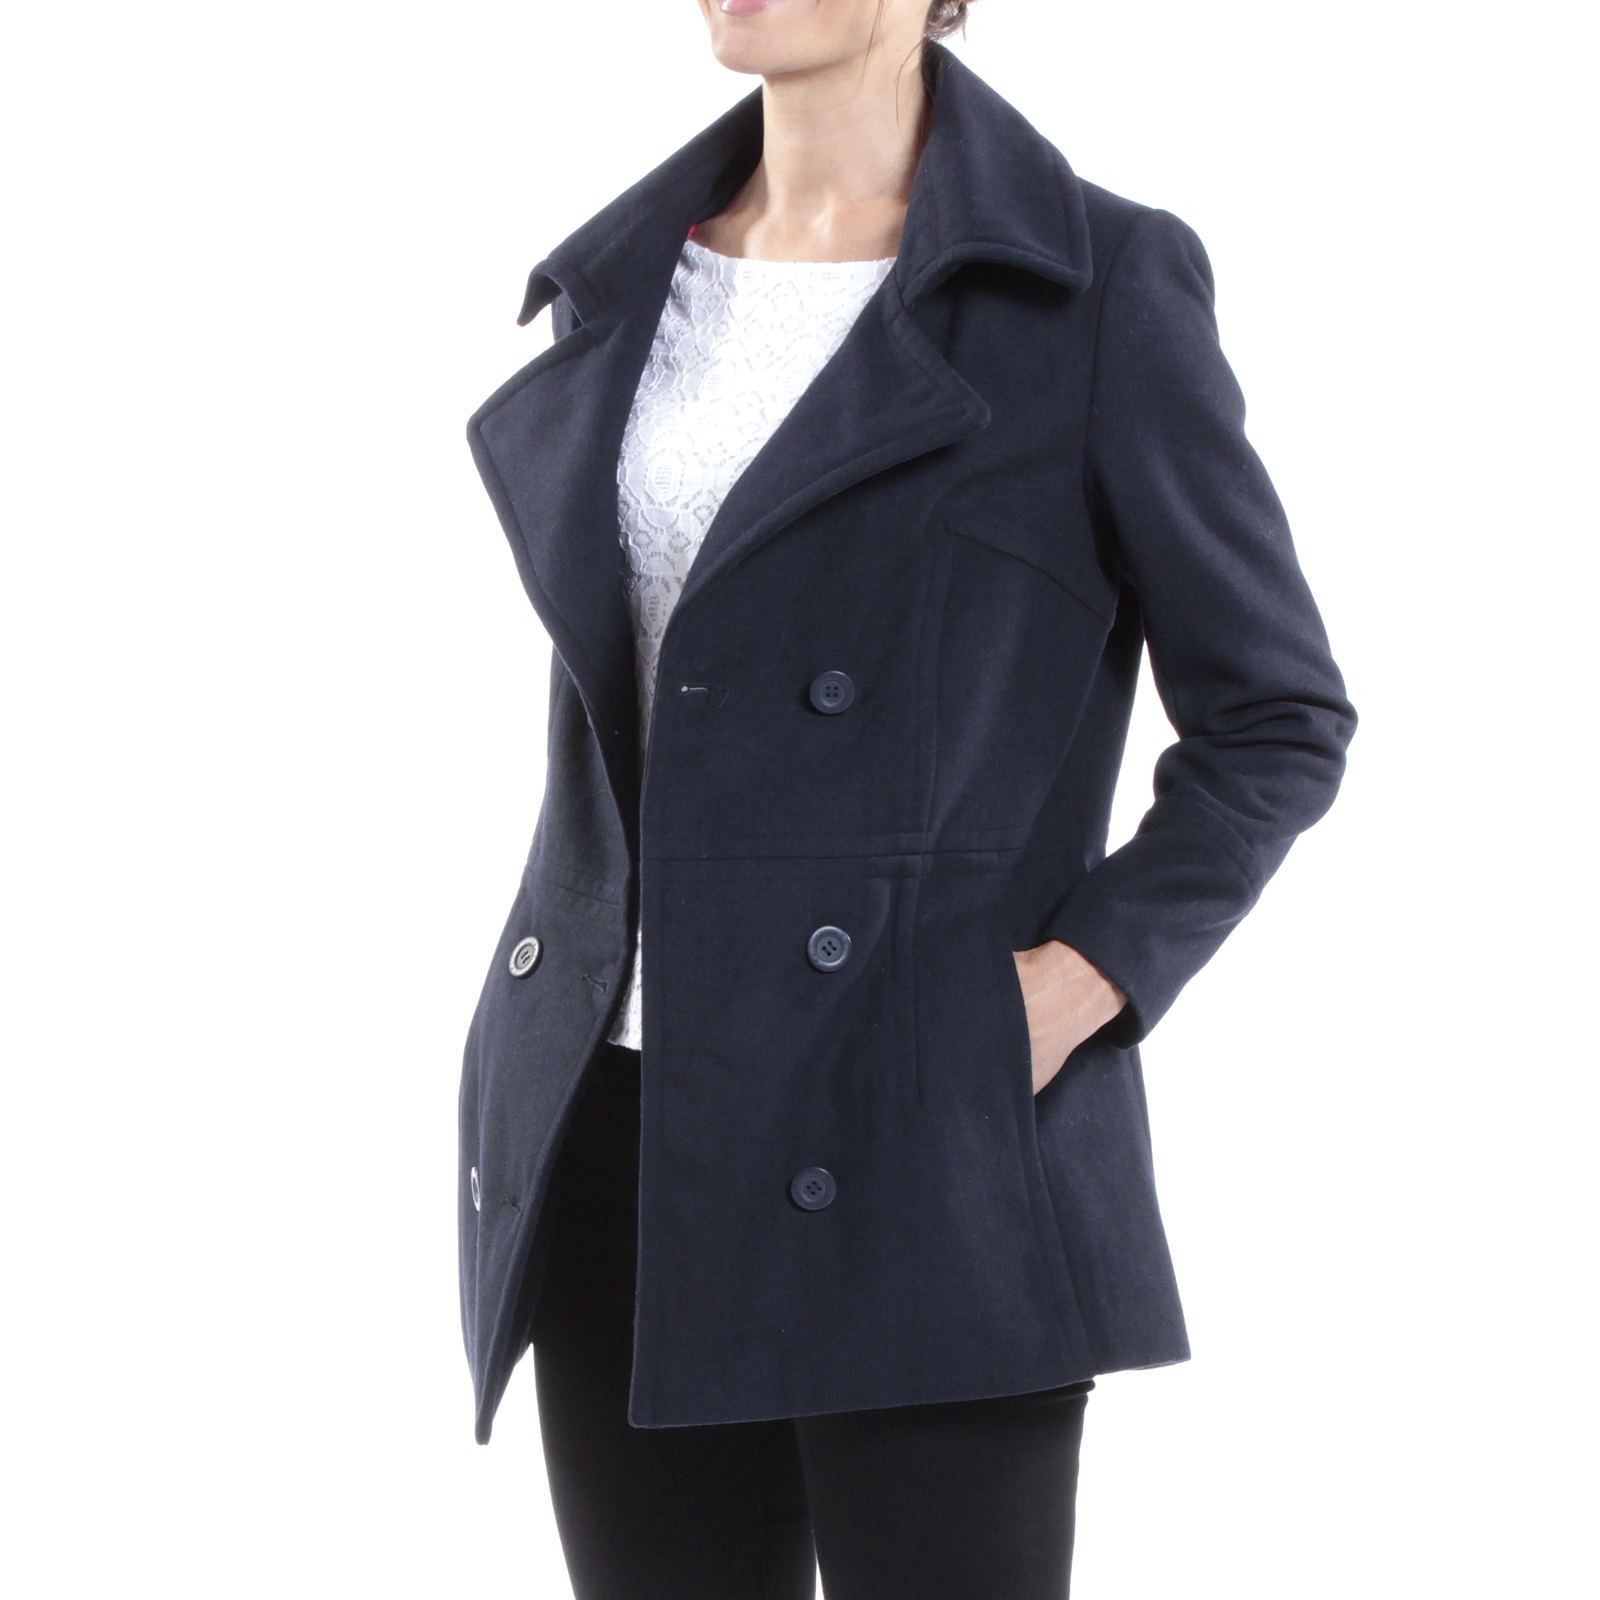 Alpine-Swiss-Emma-Womens-Peacoat-Jacket-Wool-Blazer-Double-Breasted-Overcoat-New thumbnail 55